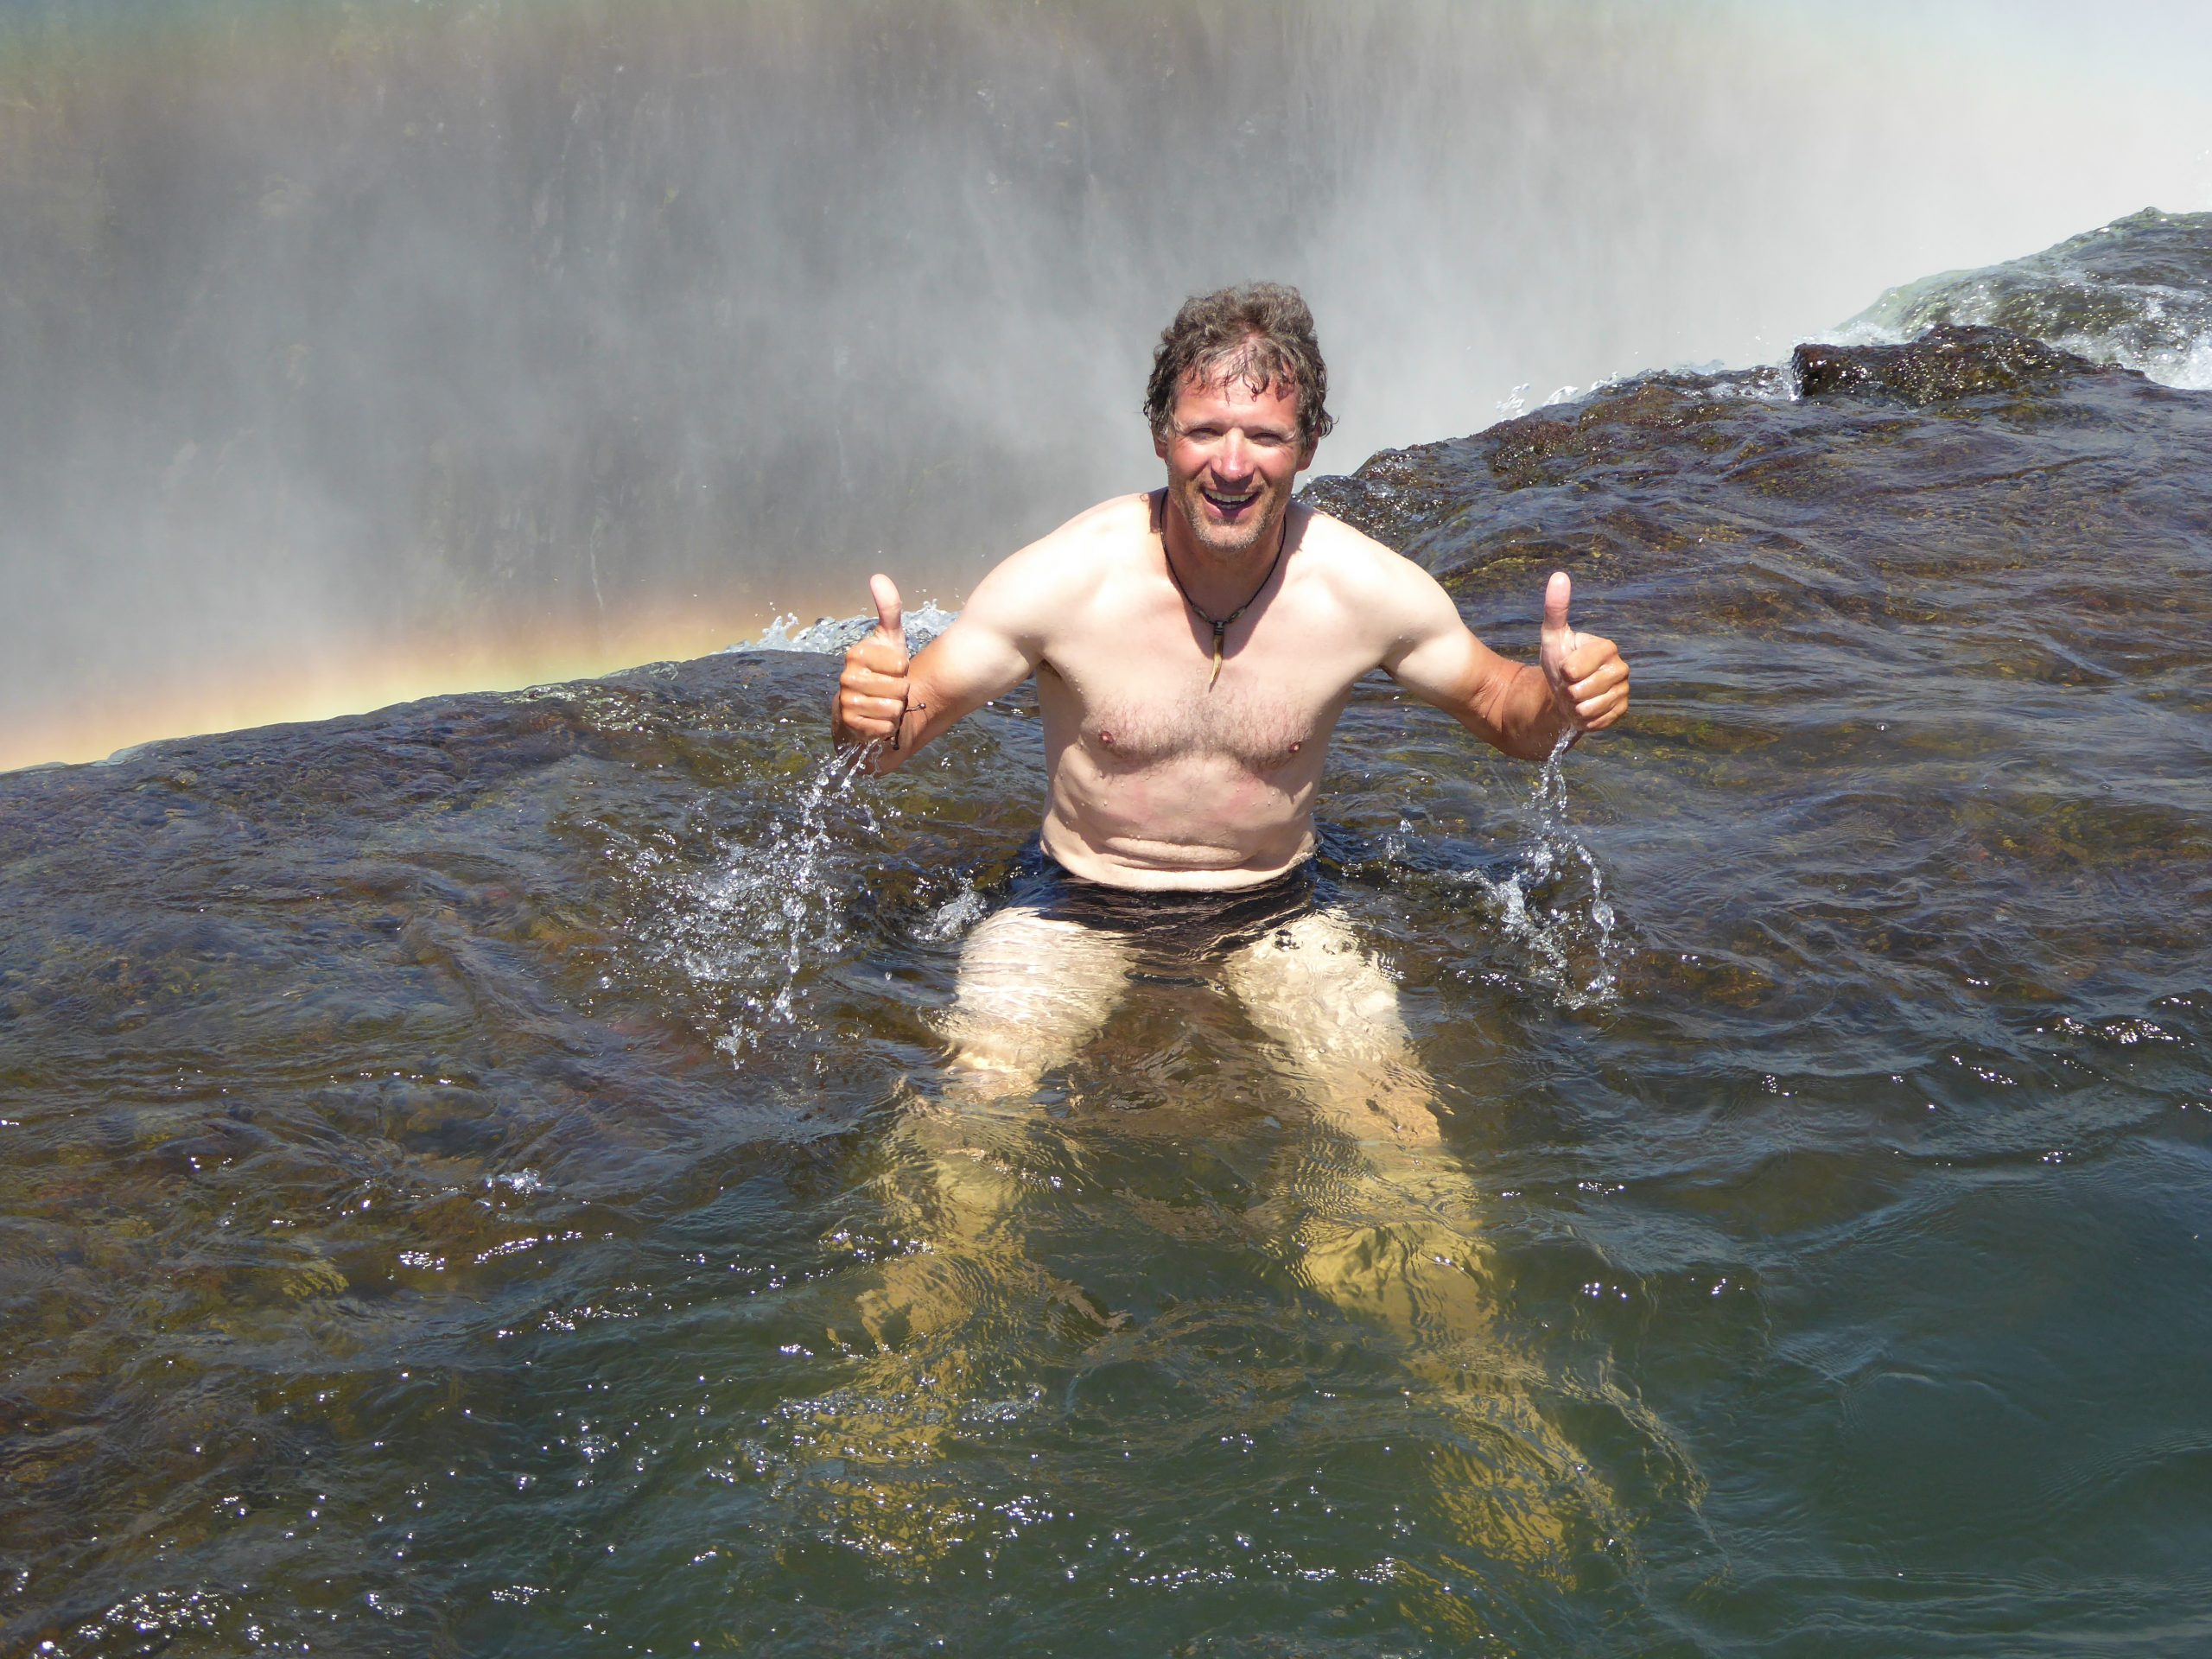 Radreise Afrika 2014 - Victoria Falls - Teufelspool